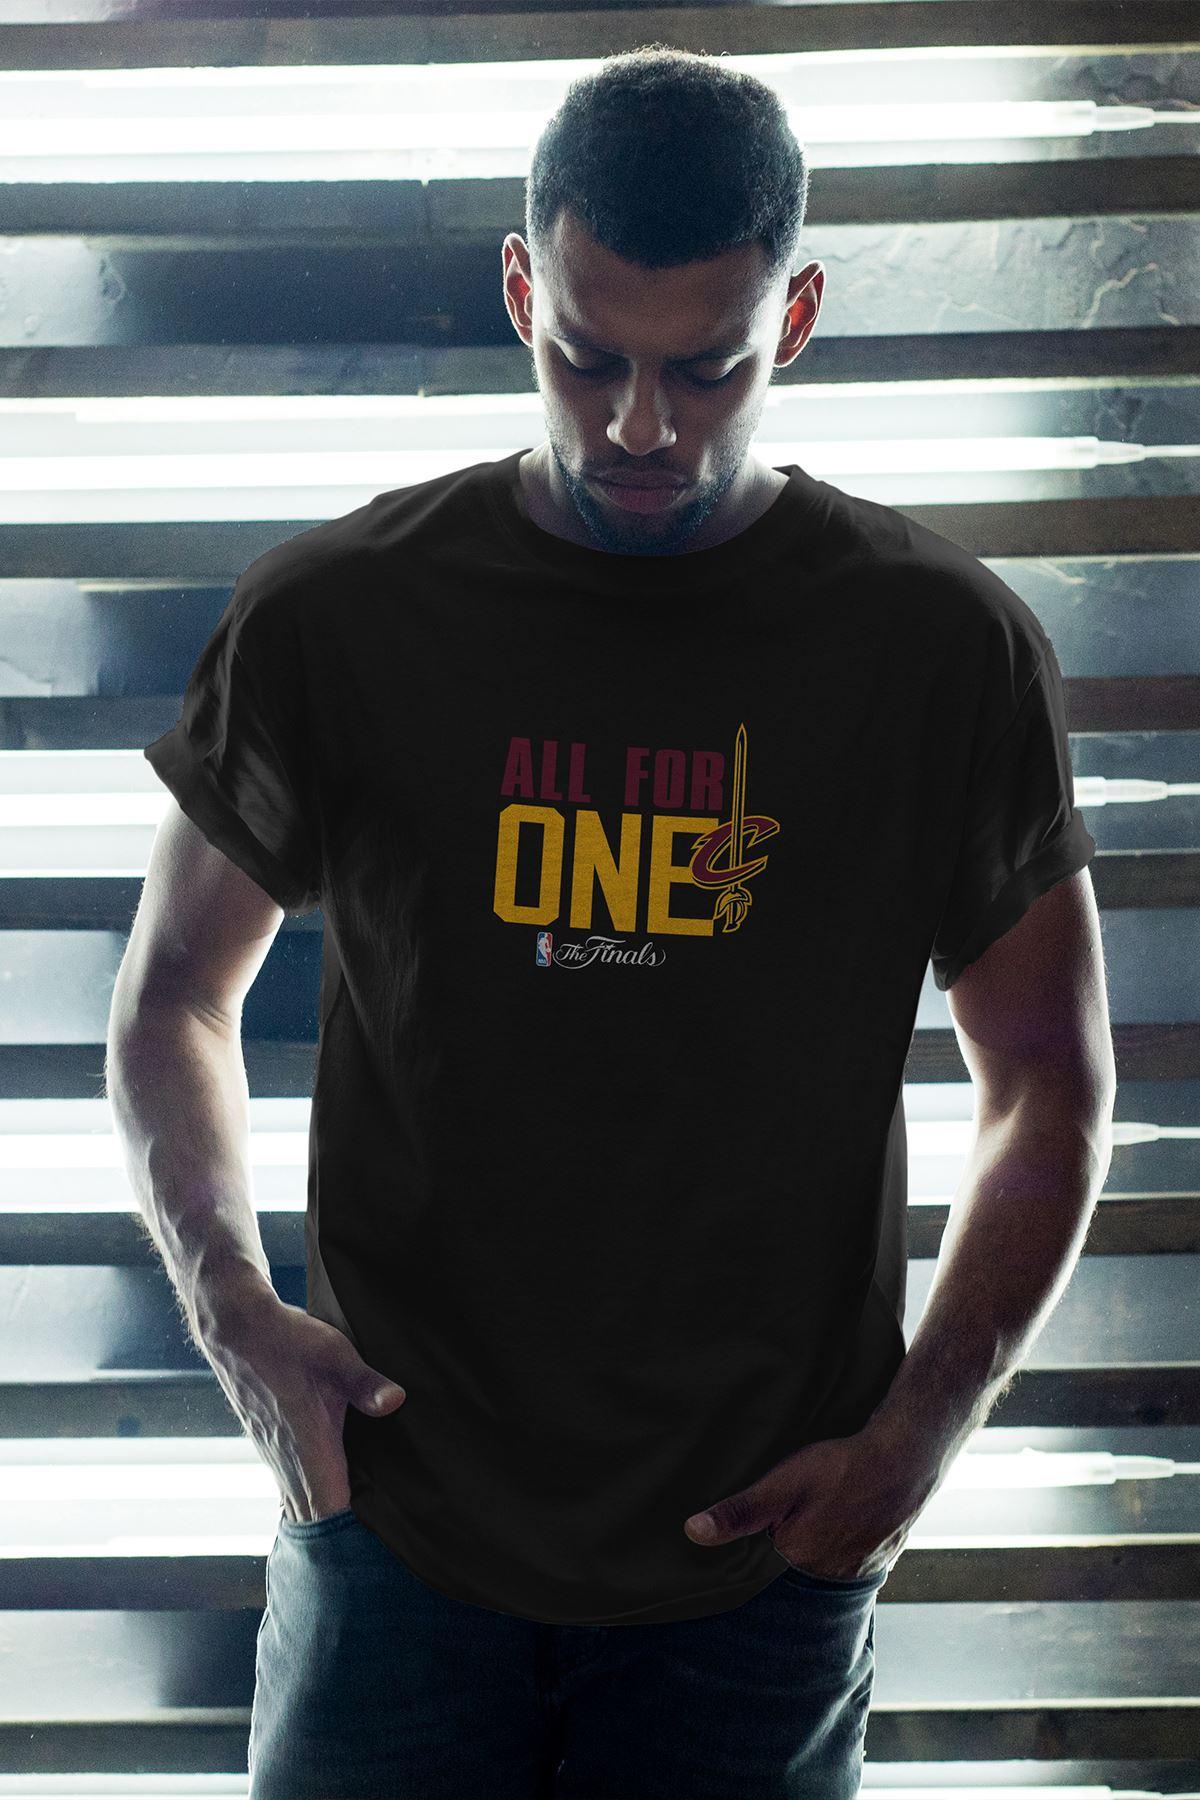 All For One Siyah Erkek Oversize Tshirt - Tişört